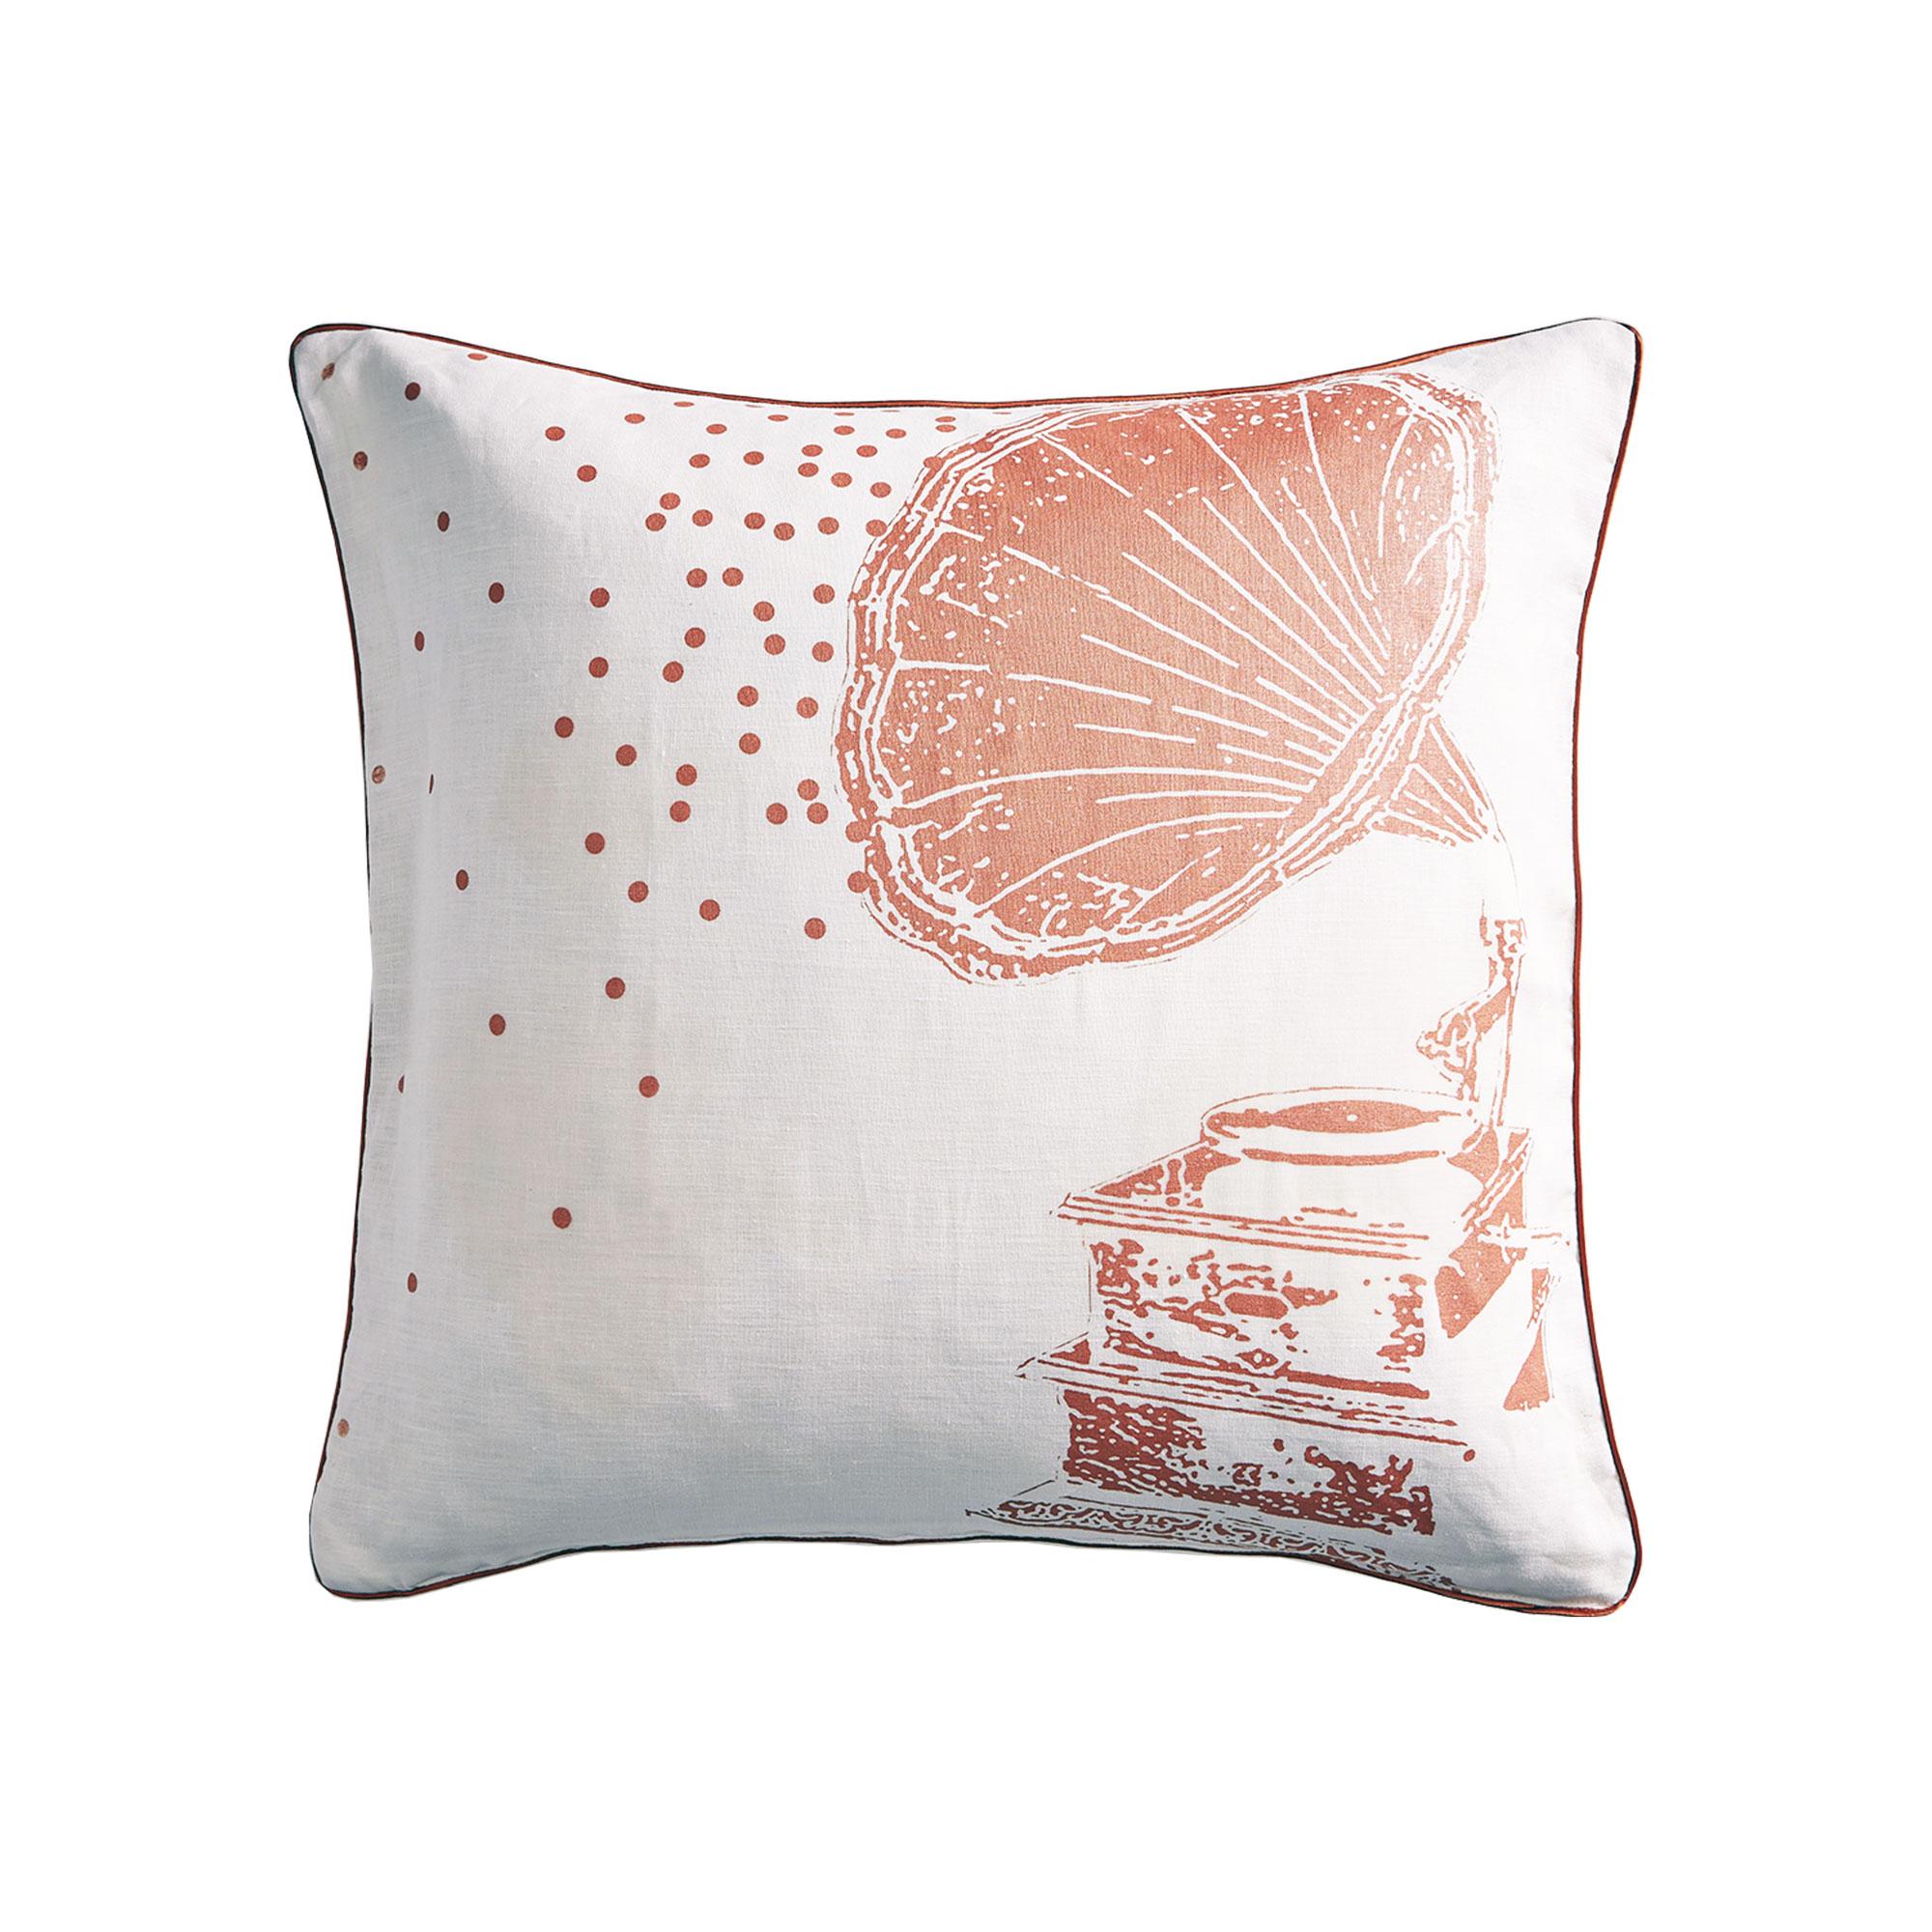 essix c coussin r cital cuivre 050 x 050 cm. Black Bedroom Furniture Sets. Home Design Ideas